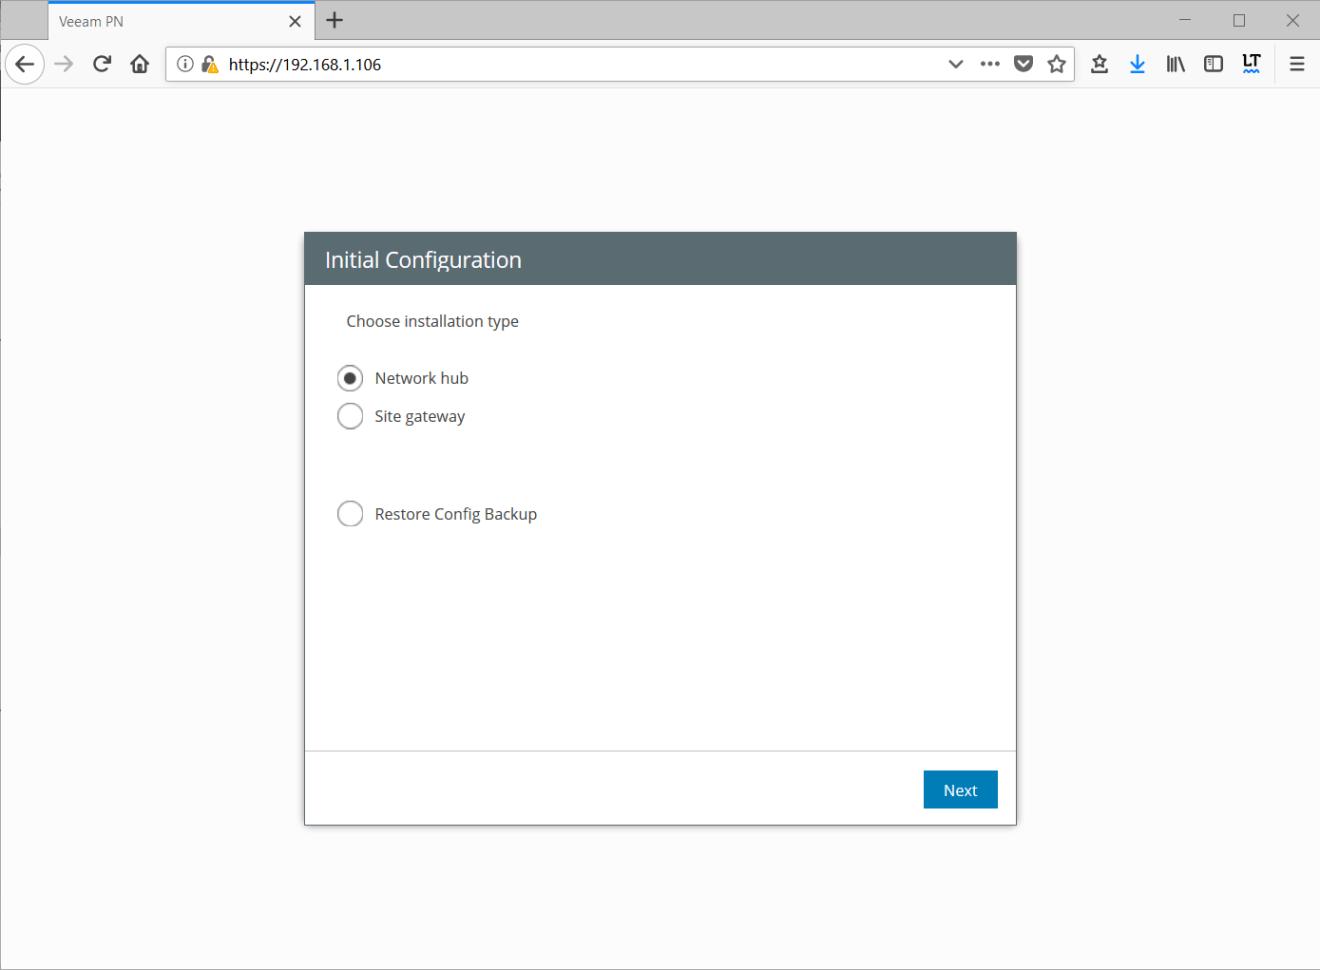 domalab.com Veeam PN initial configuration